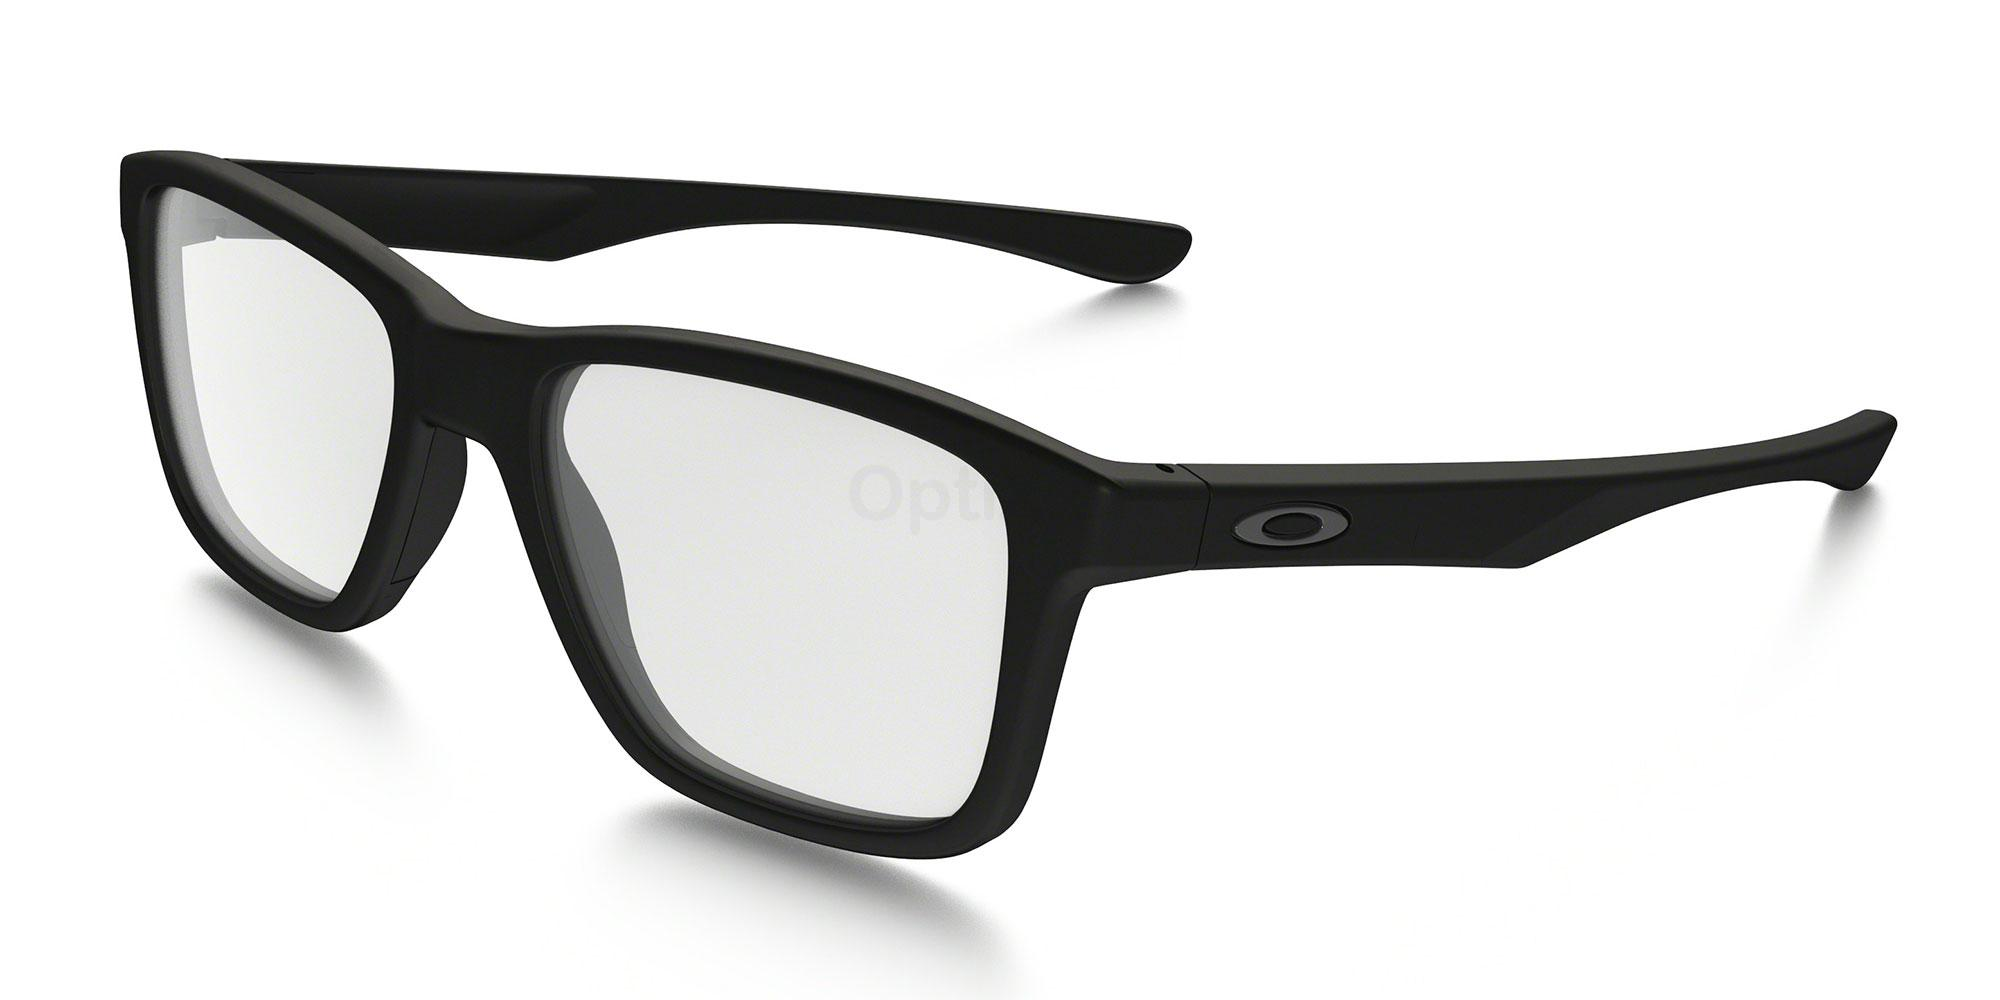 810701 OX8107 TRIM PLANE Glasses, Oakley